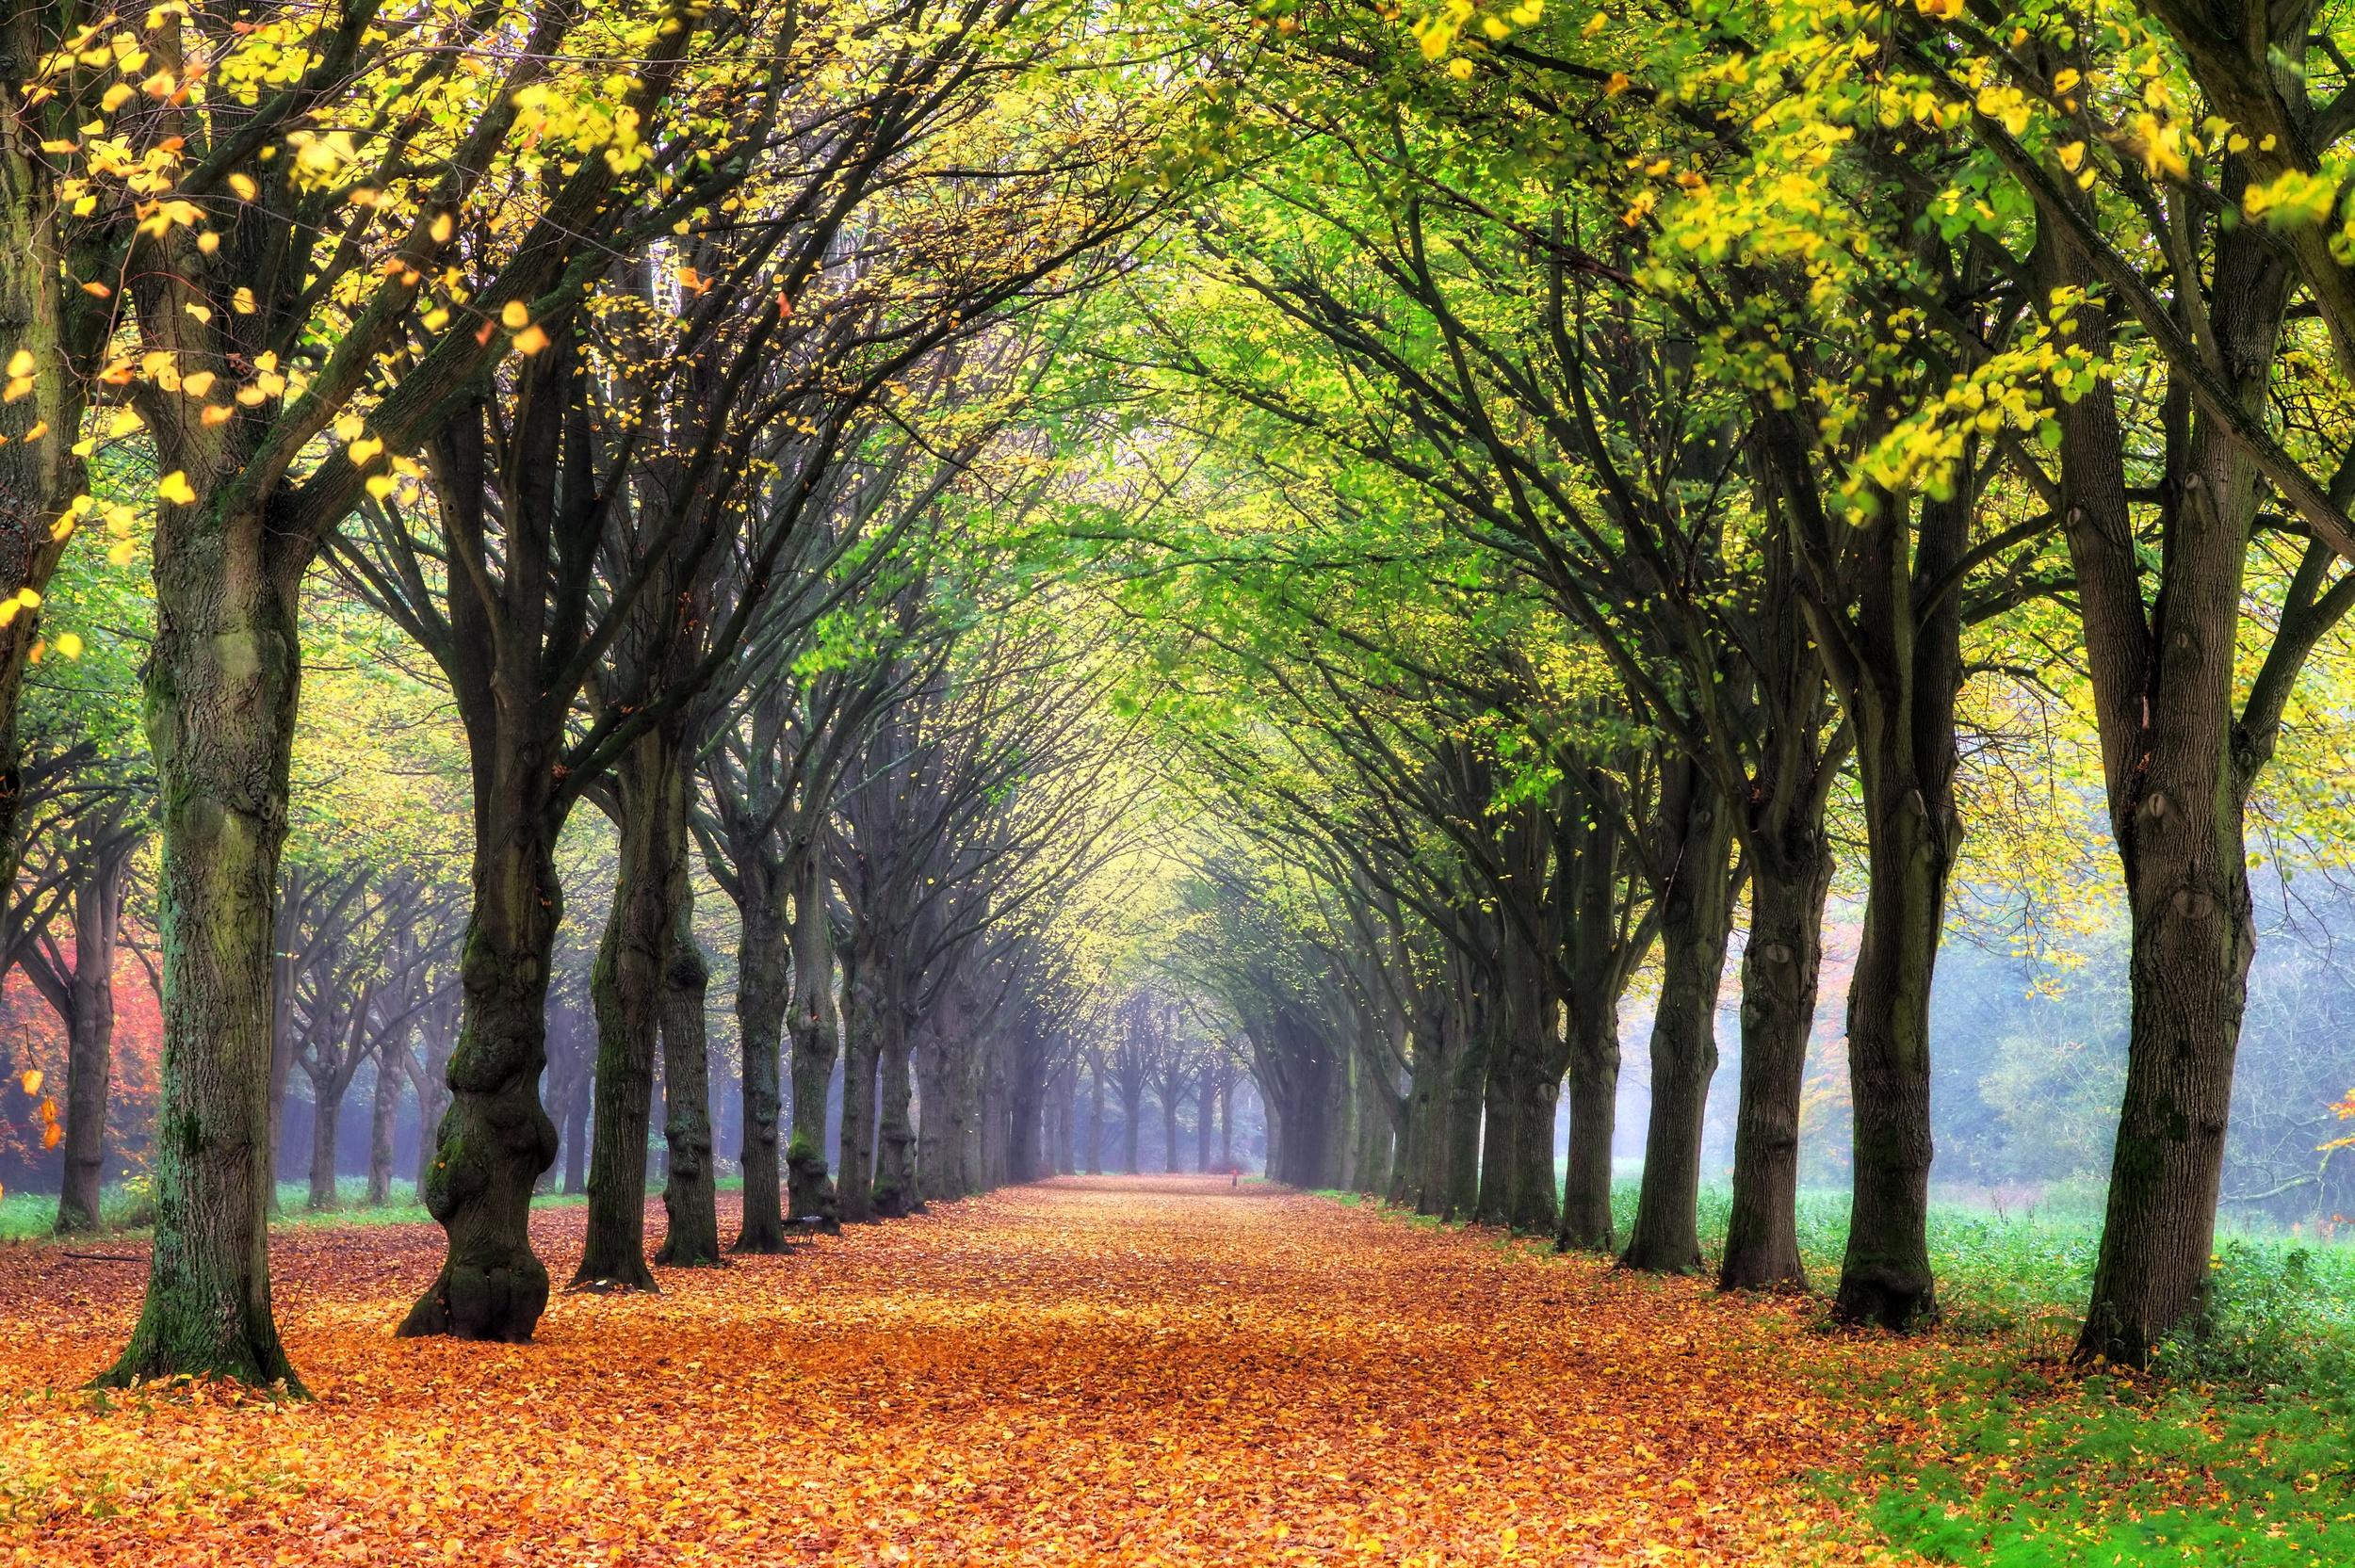 Amsterdamse Bos - Amsterdam Forest